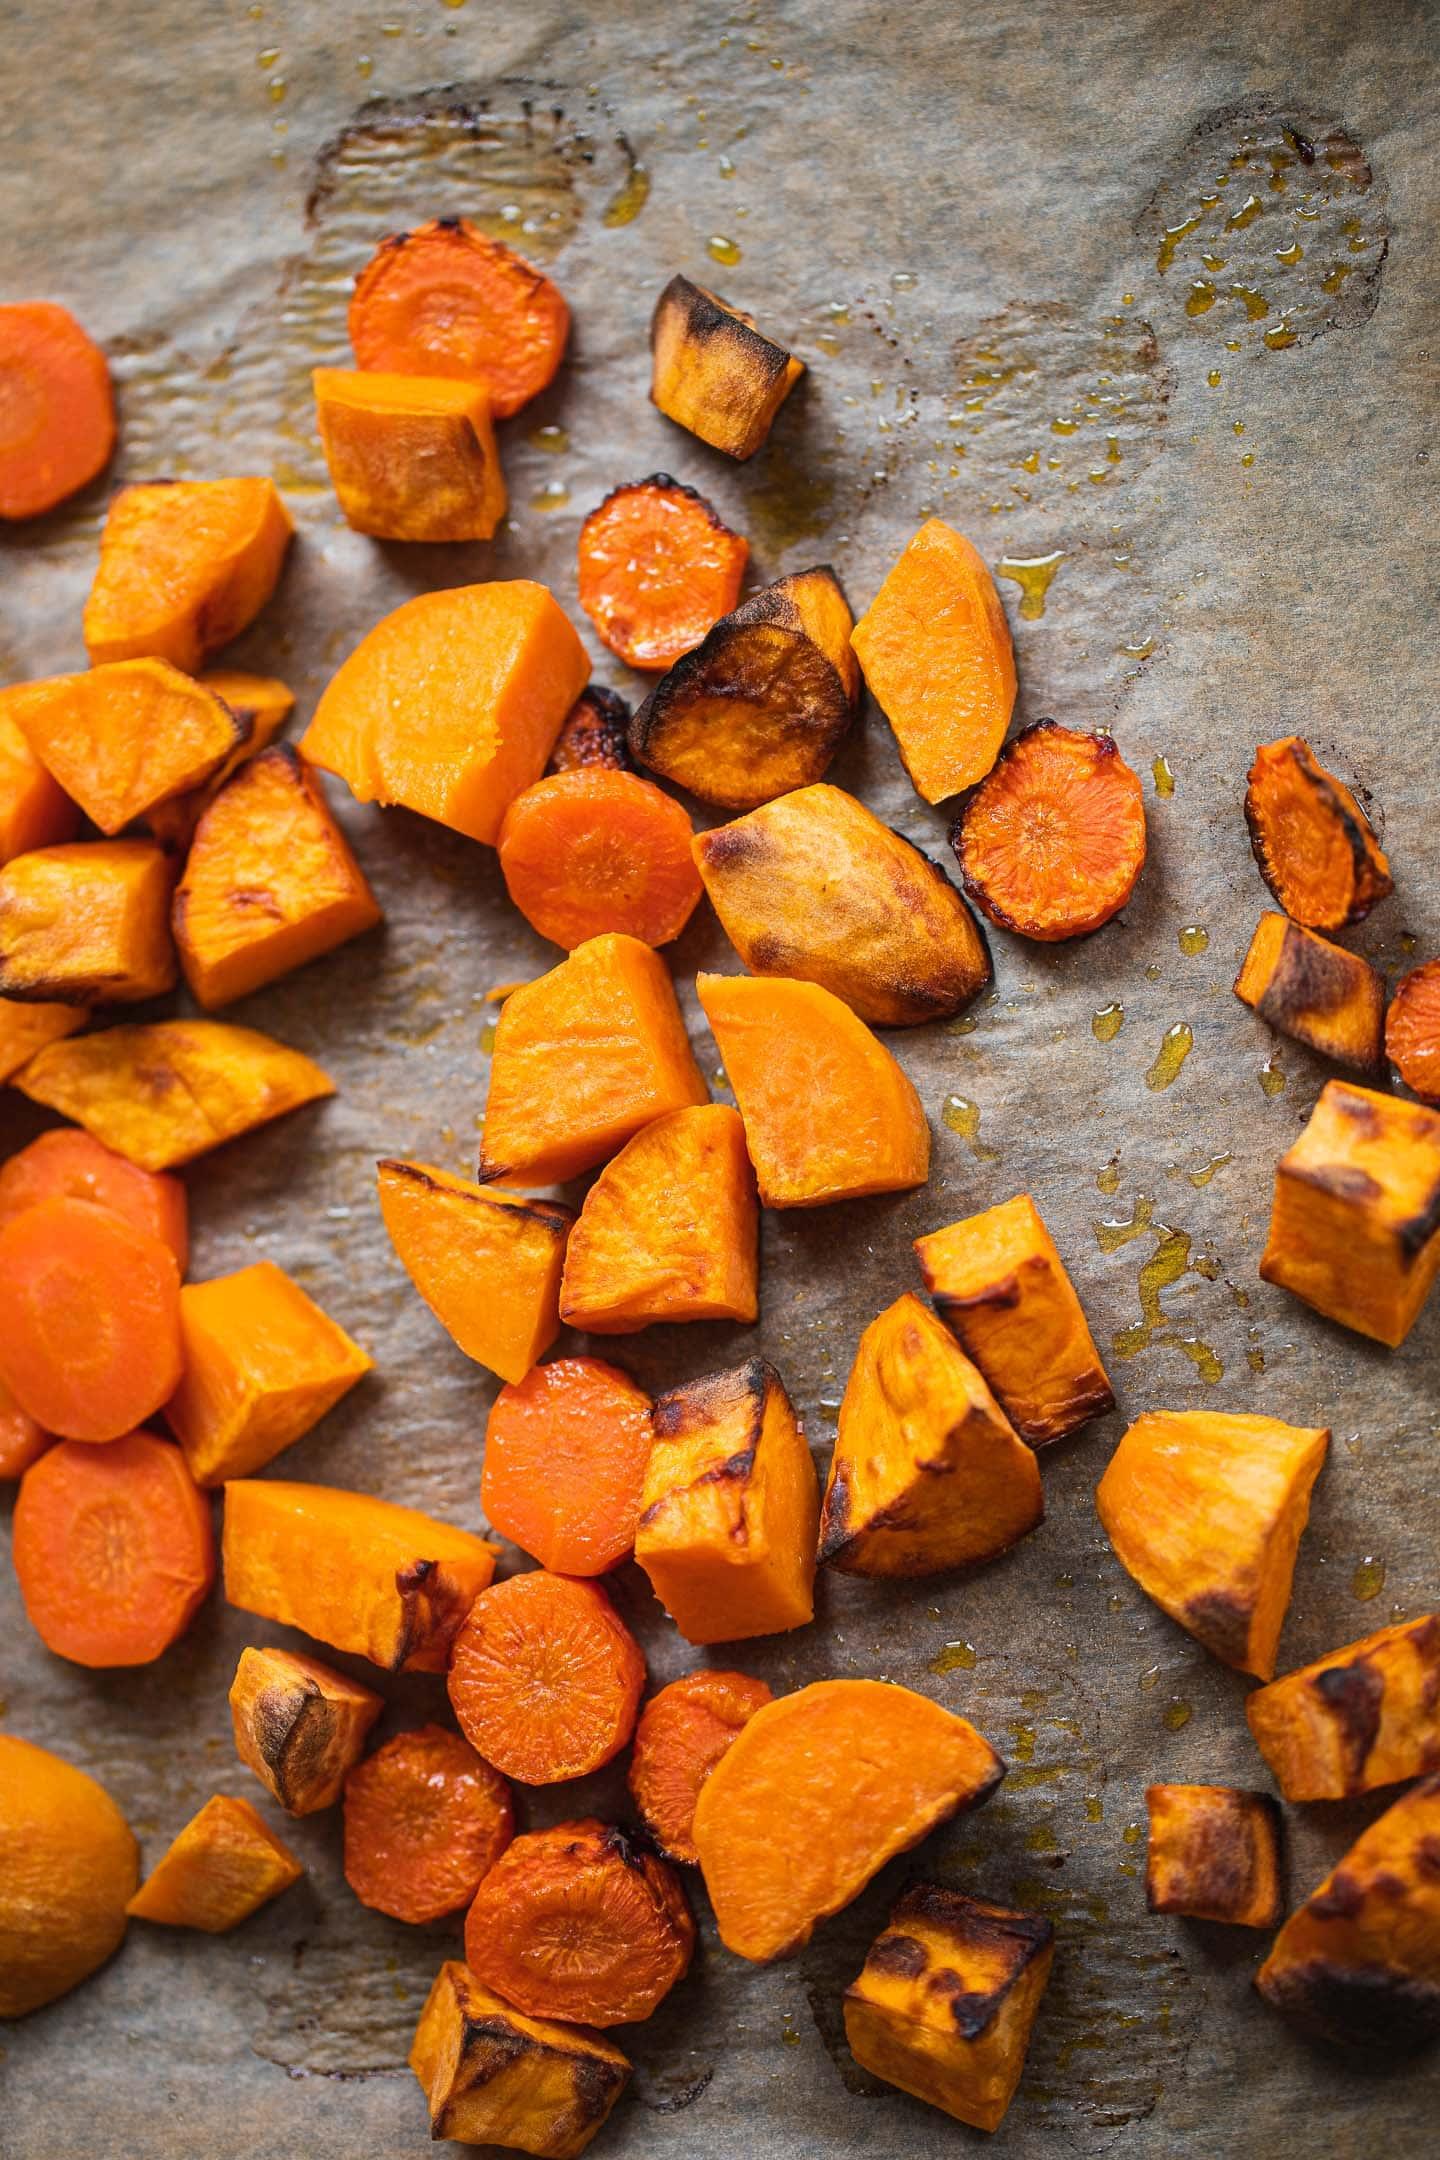 Roasted sweet potato and carrots on a baking tray